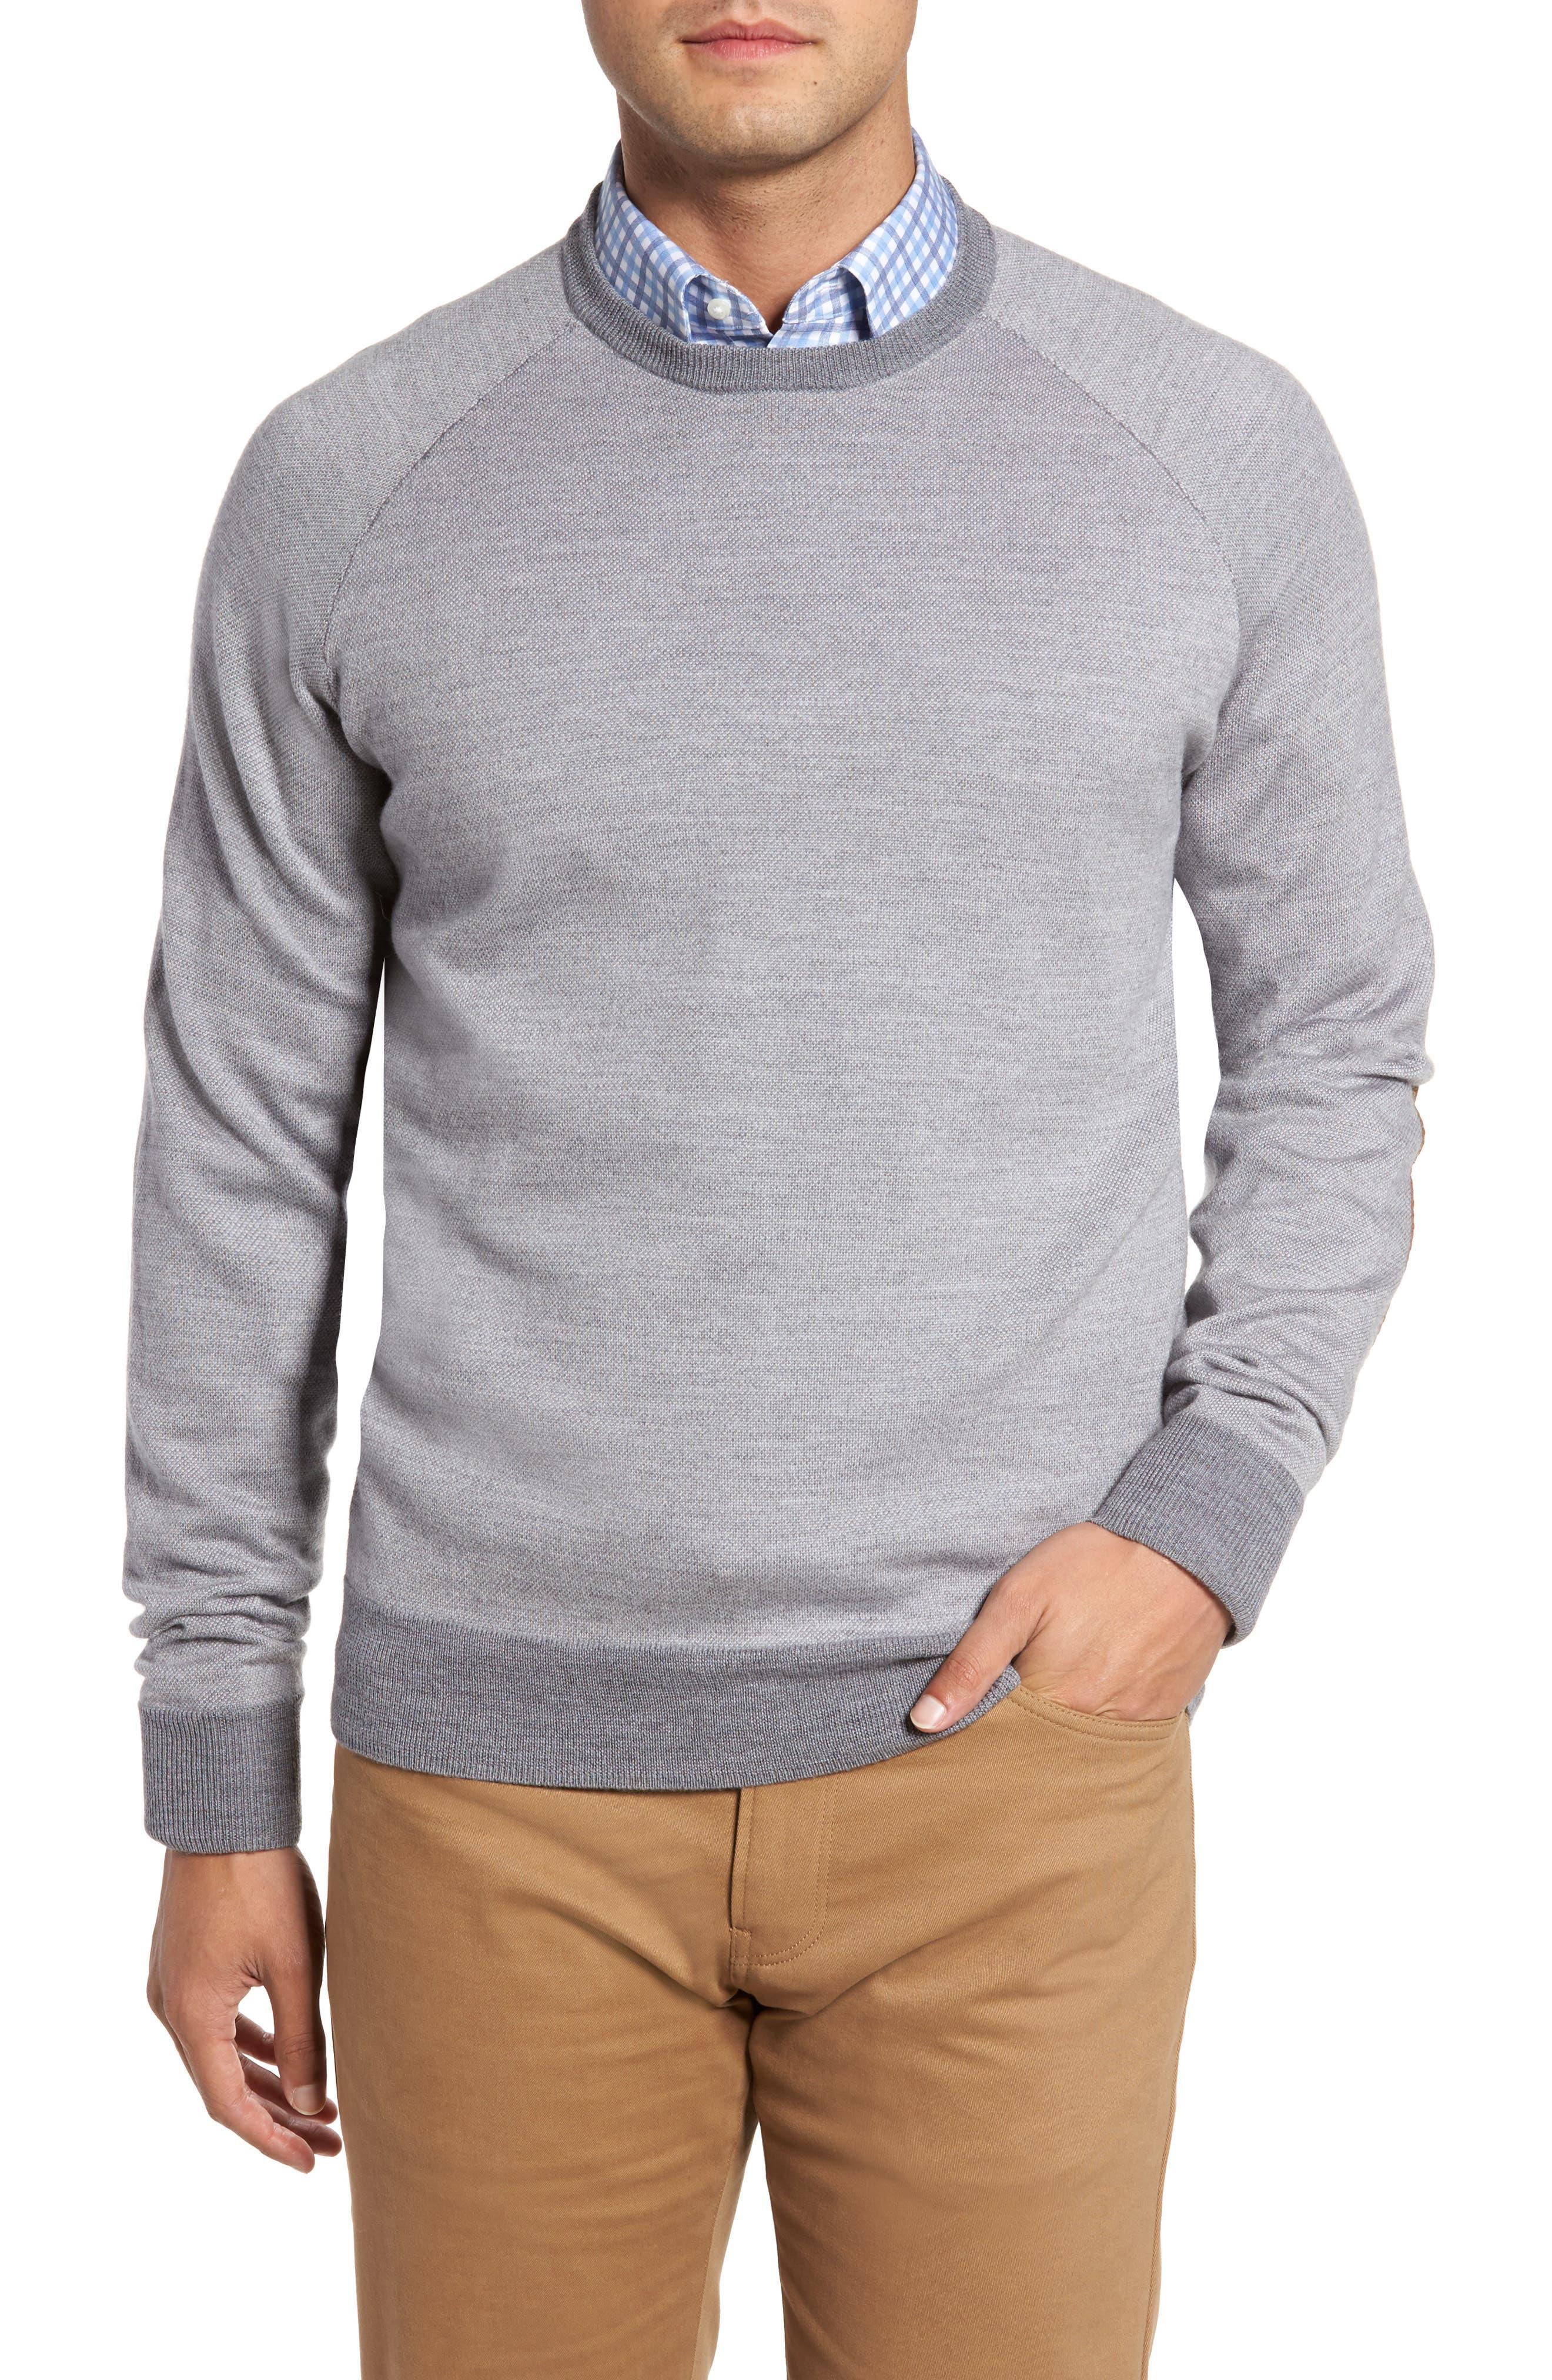 Soltice Merino Sweater,                             Main thumbnail 1, color,                             Stingray